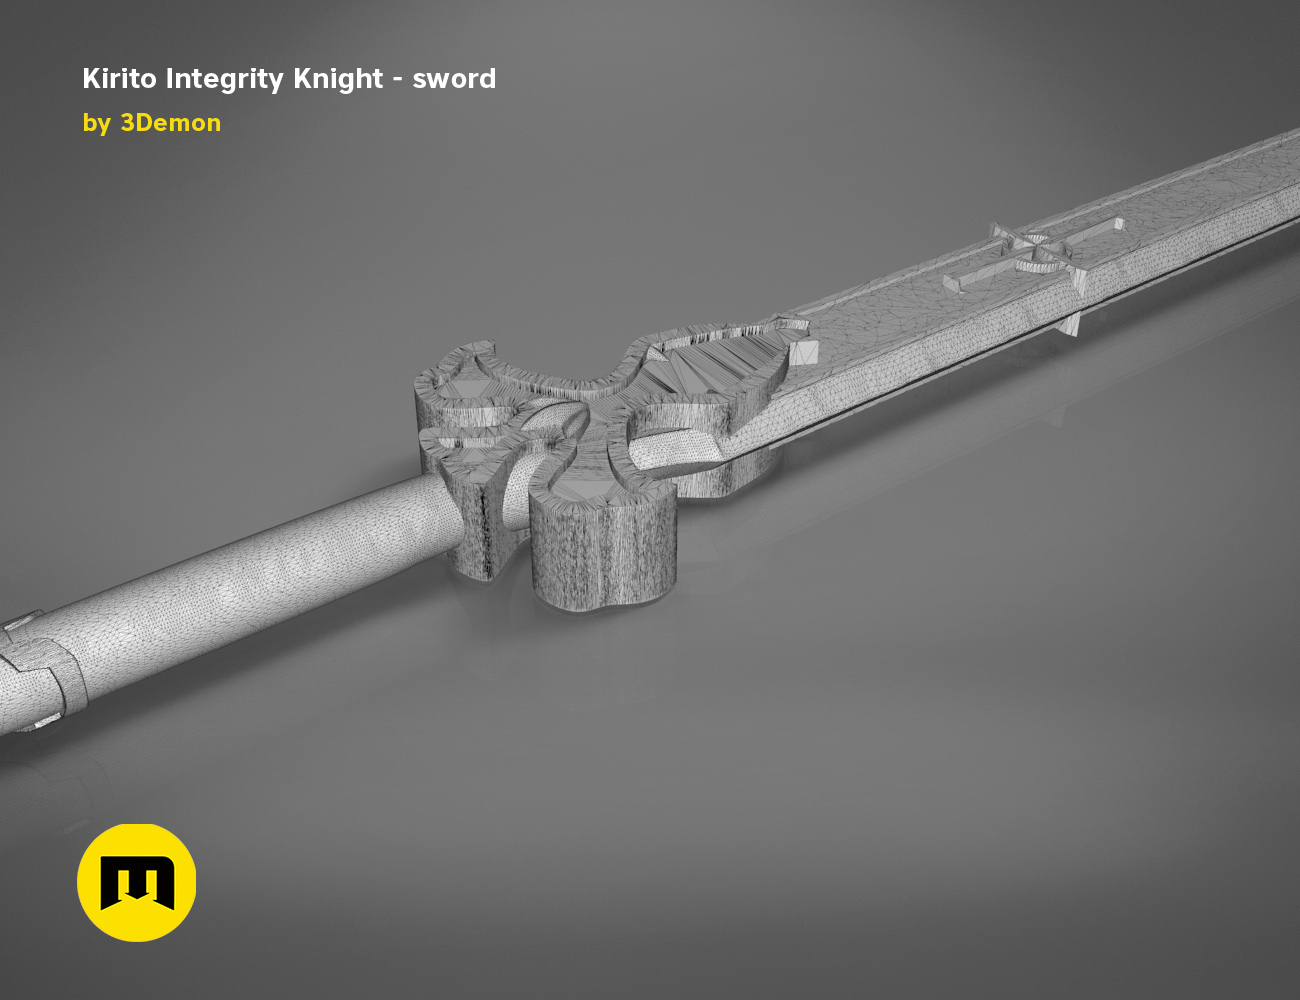 render_scene_Integrity-knight-sword-mesh.20 kopie.jpg Download STL file Kirito's Sword - Integrity Knight • 3D print model, 3D-mon